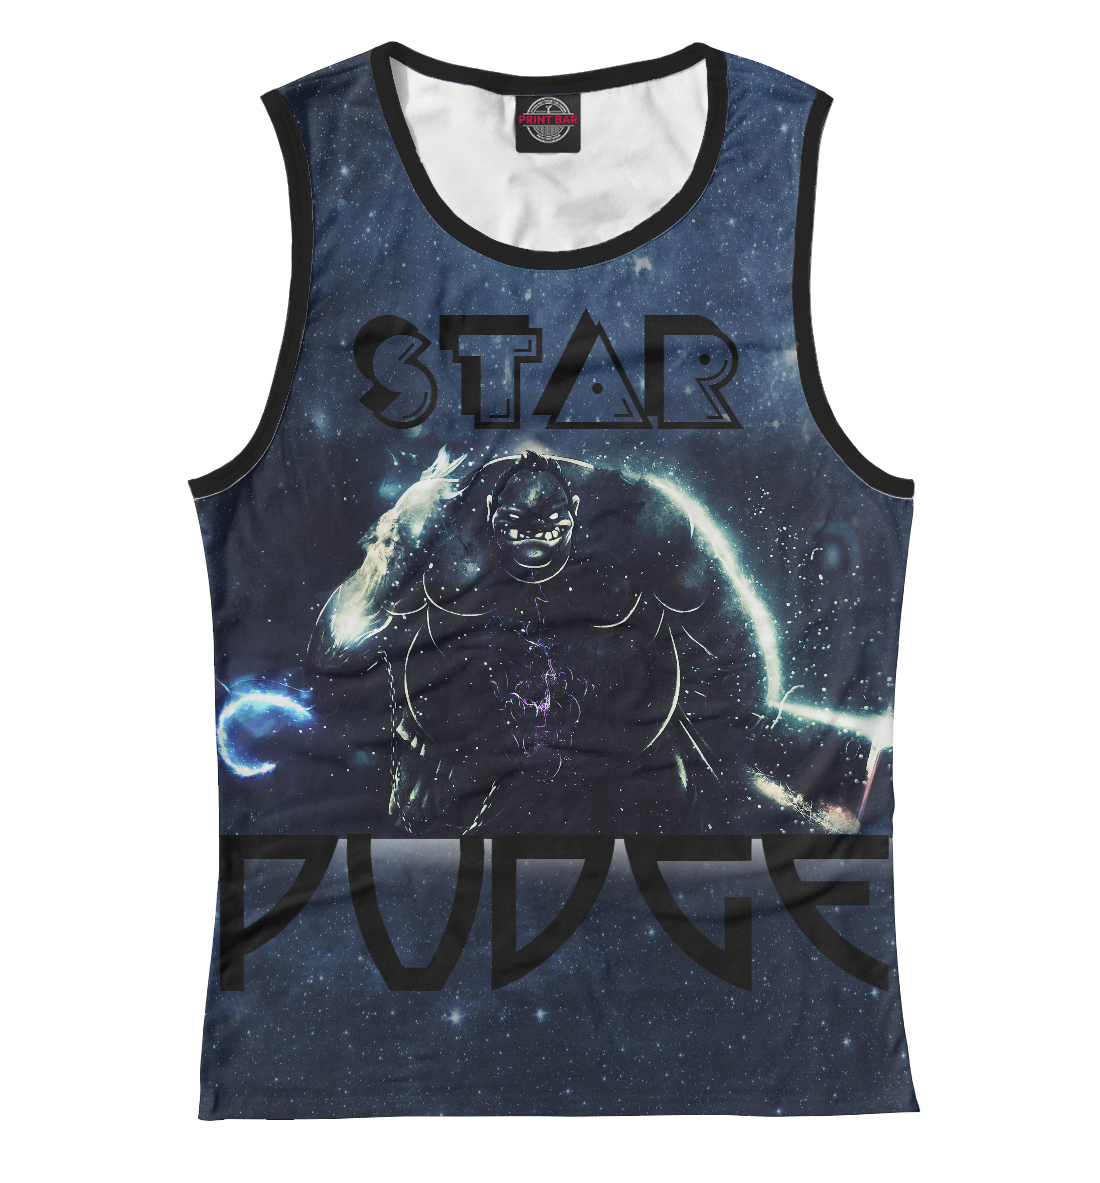 Купить Звёздный Пудж (Star Pudge), Printbar, Майки, DO2-935955-may-1